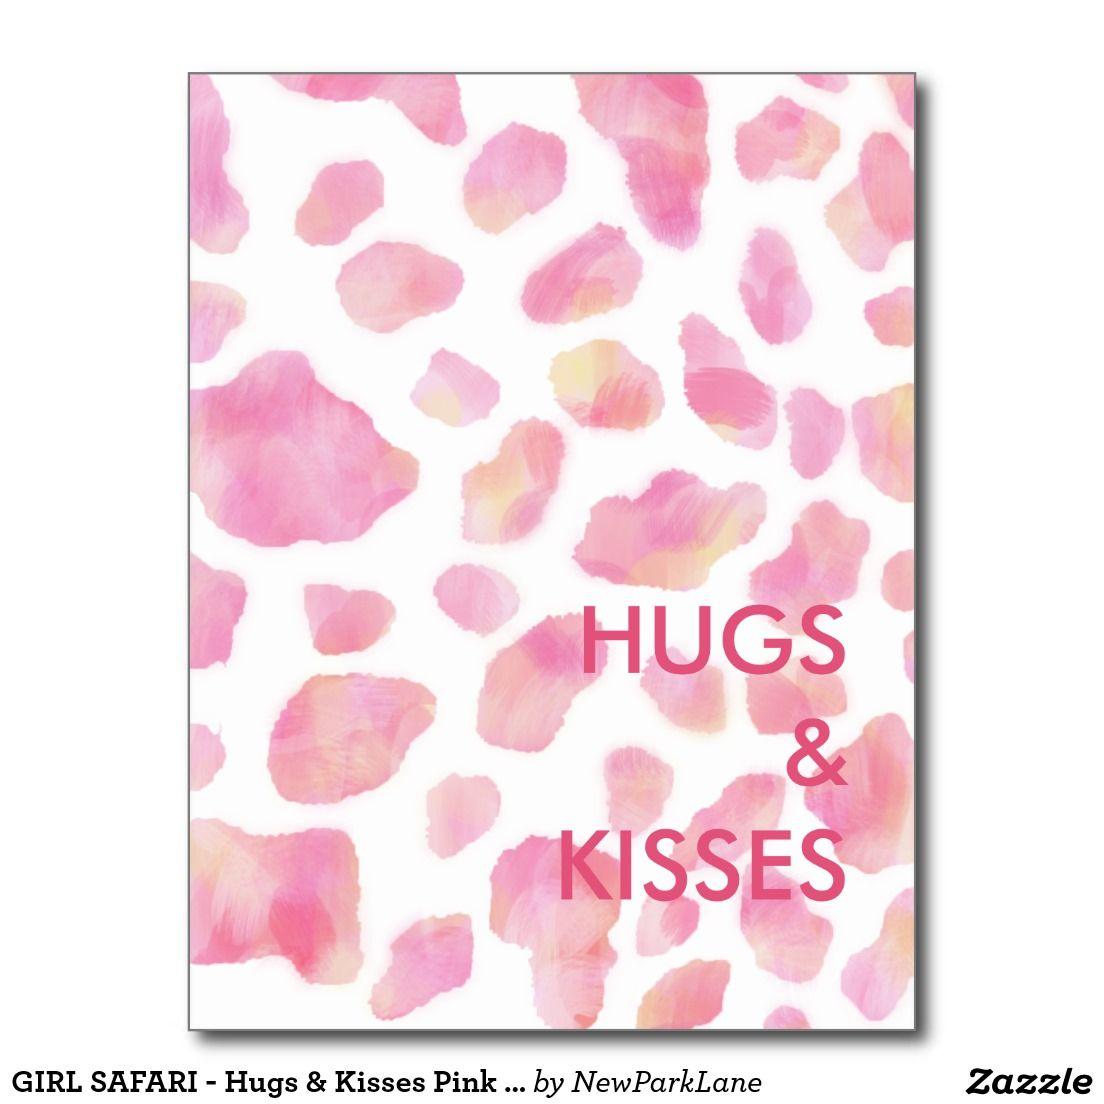 GIRL SAFARI - Hugs & Kisses Pink Leopard print postcard. So cute! http://www.zazzle.com/girl_safari_hugs_kisses_pink_leopard_print_postcard-239885297639282603?rf=238731775801296307